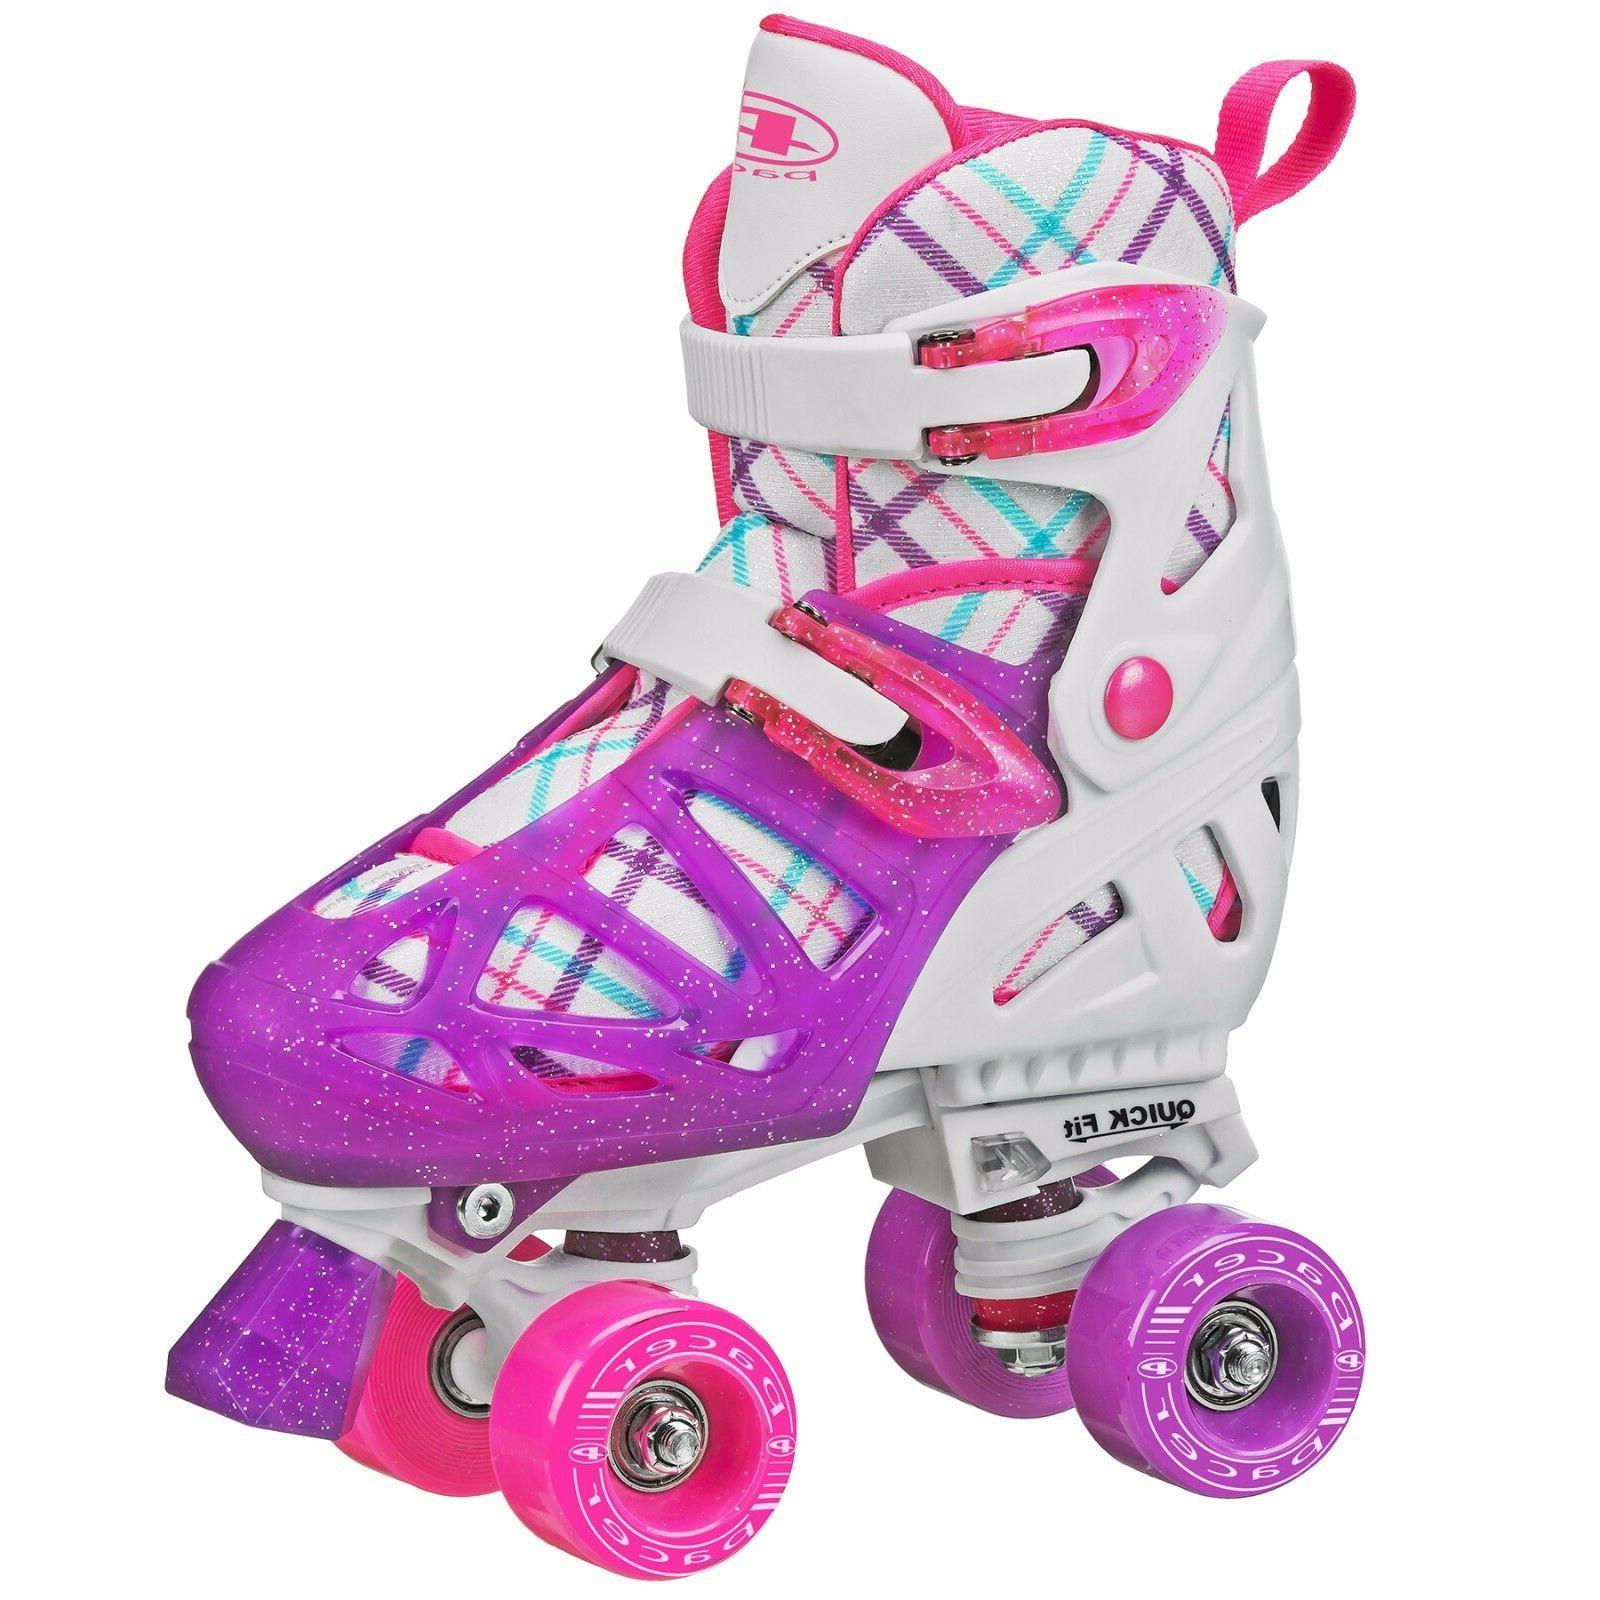 xt70 adjustable quad roller skate children skates